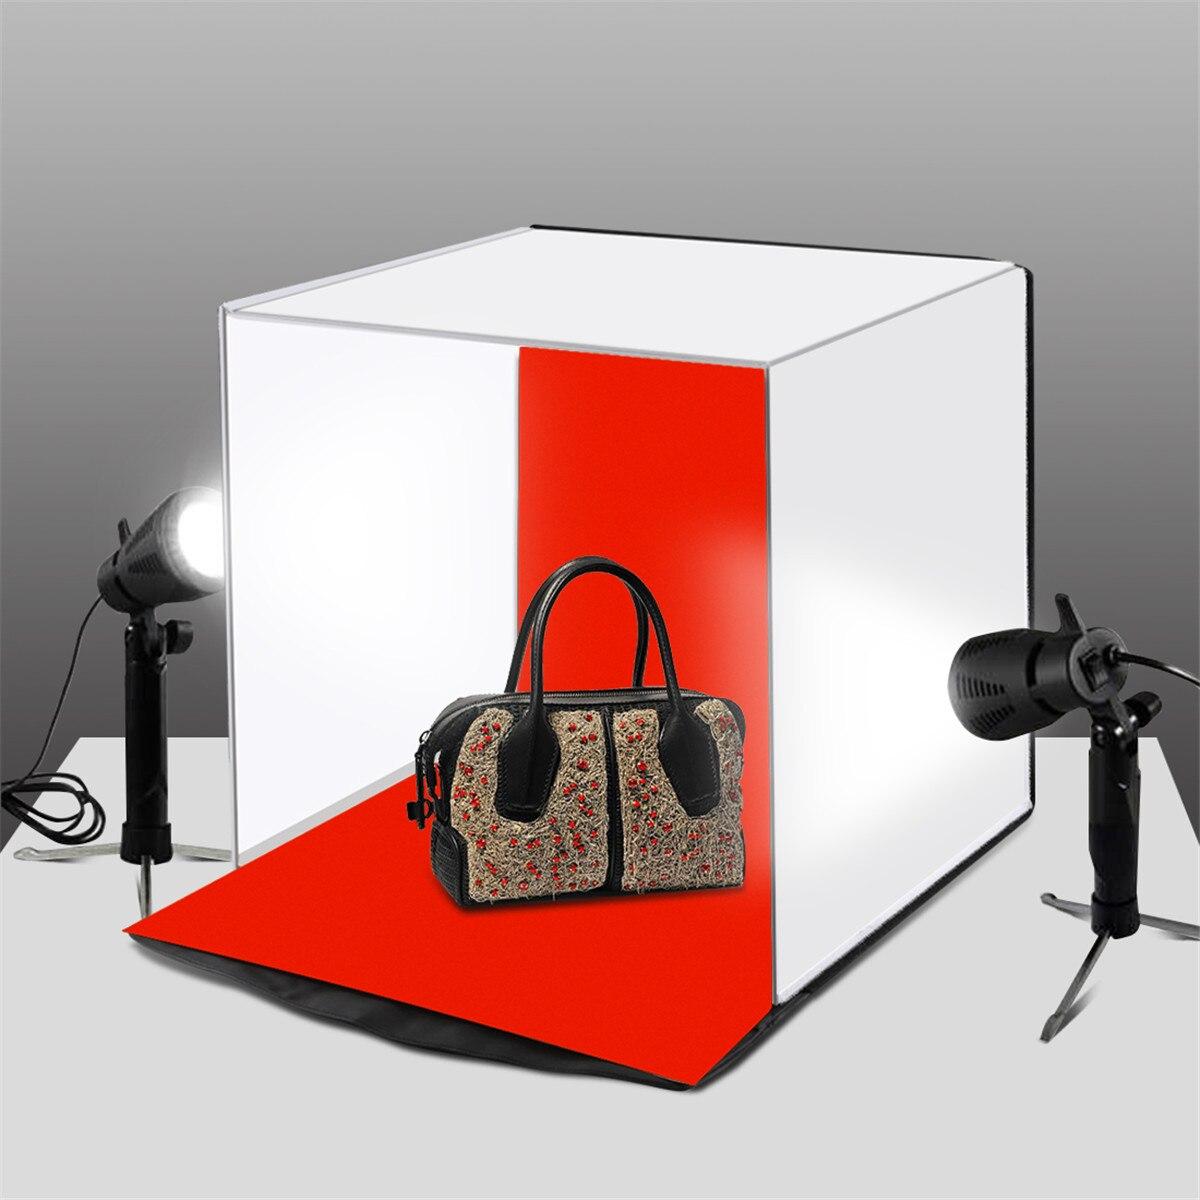 купить New Arrival 40x40x40cm Softbox Portable Photography Boxes Photo Studio Box Photography Backdrop Room Mini Tent недорого